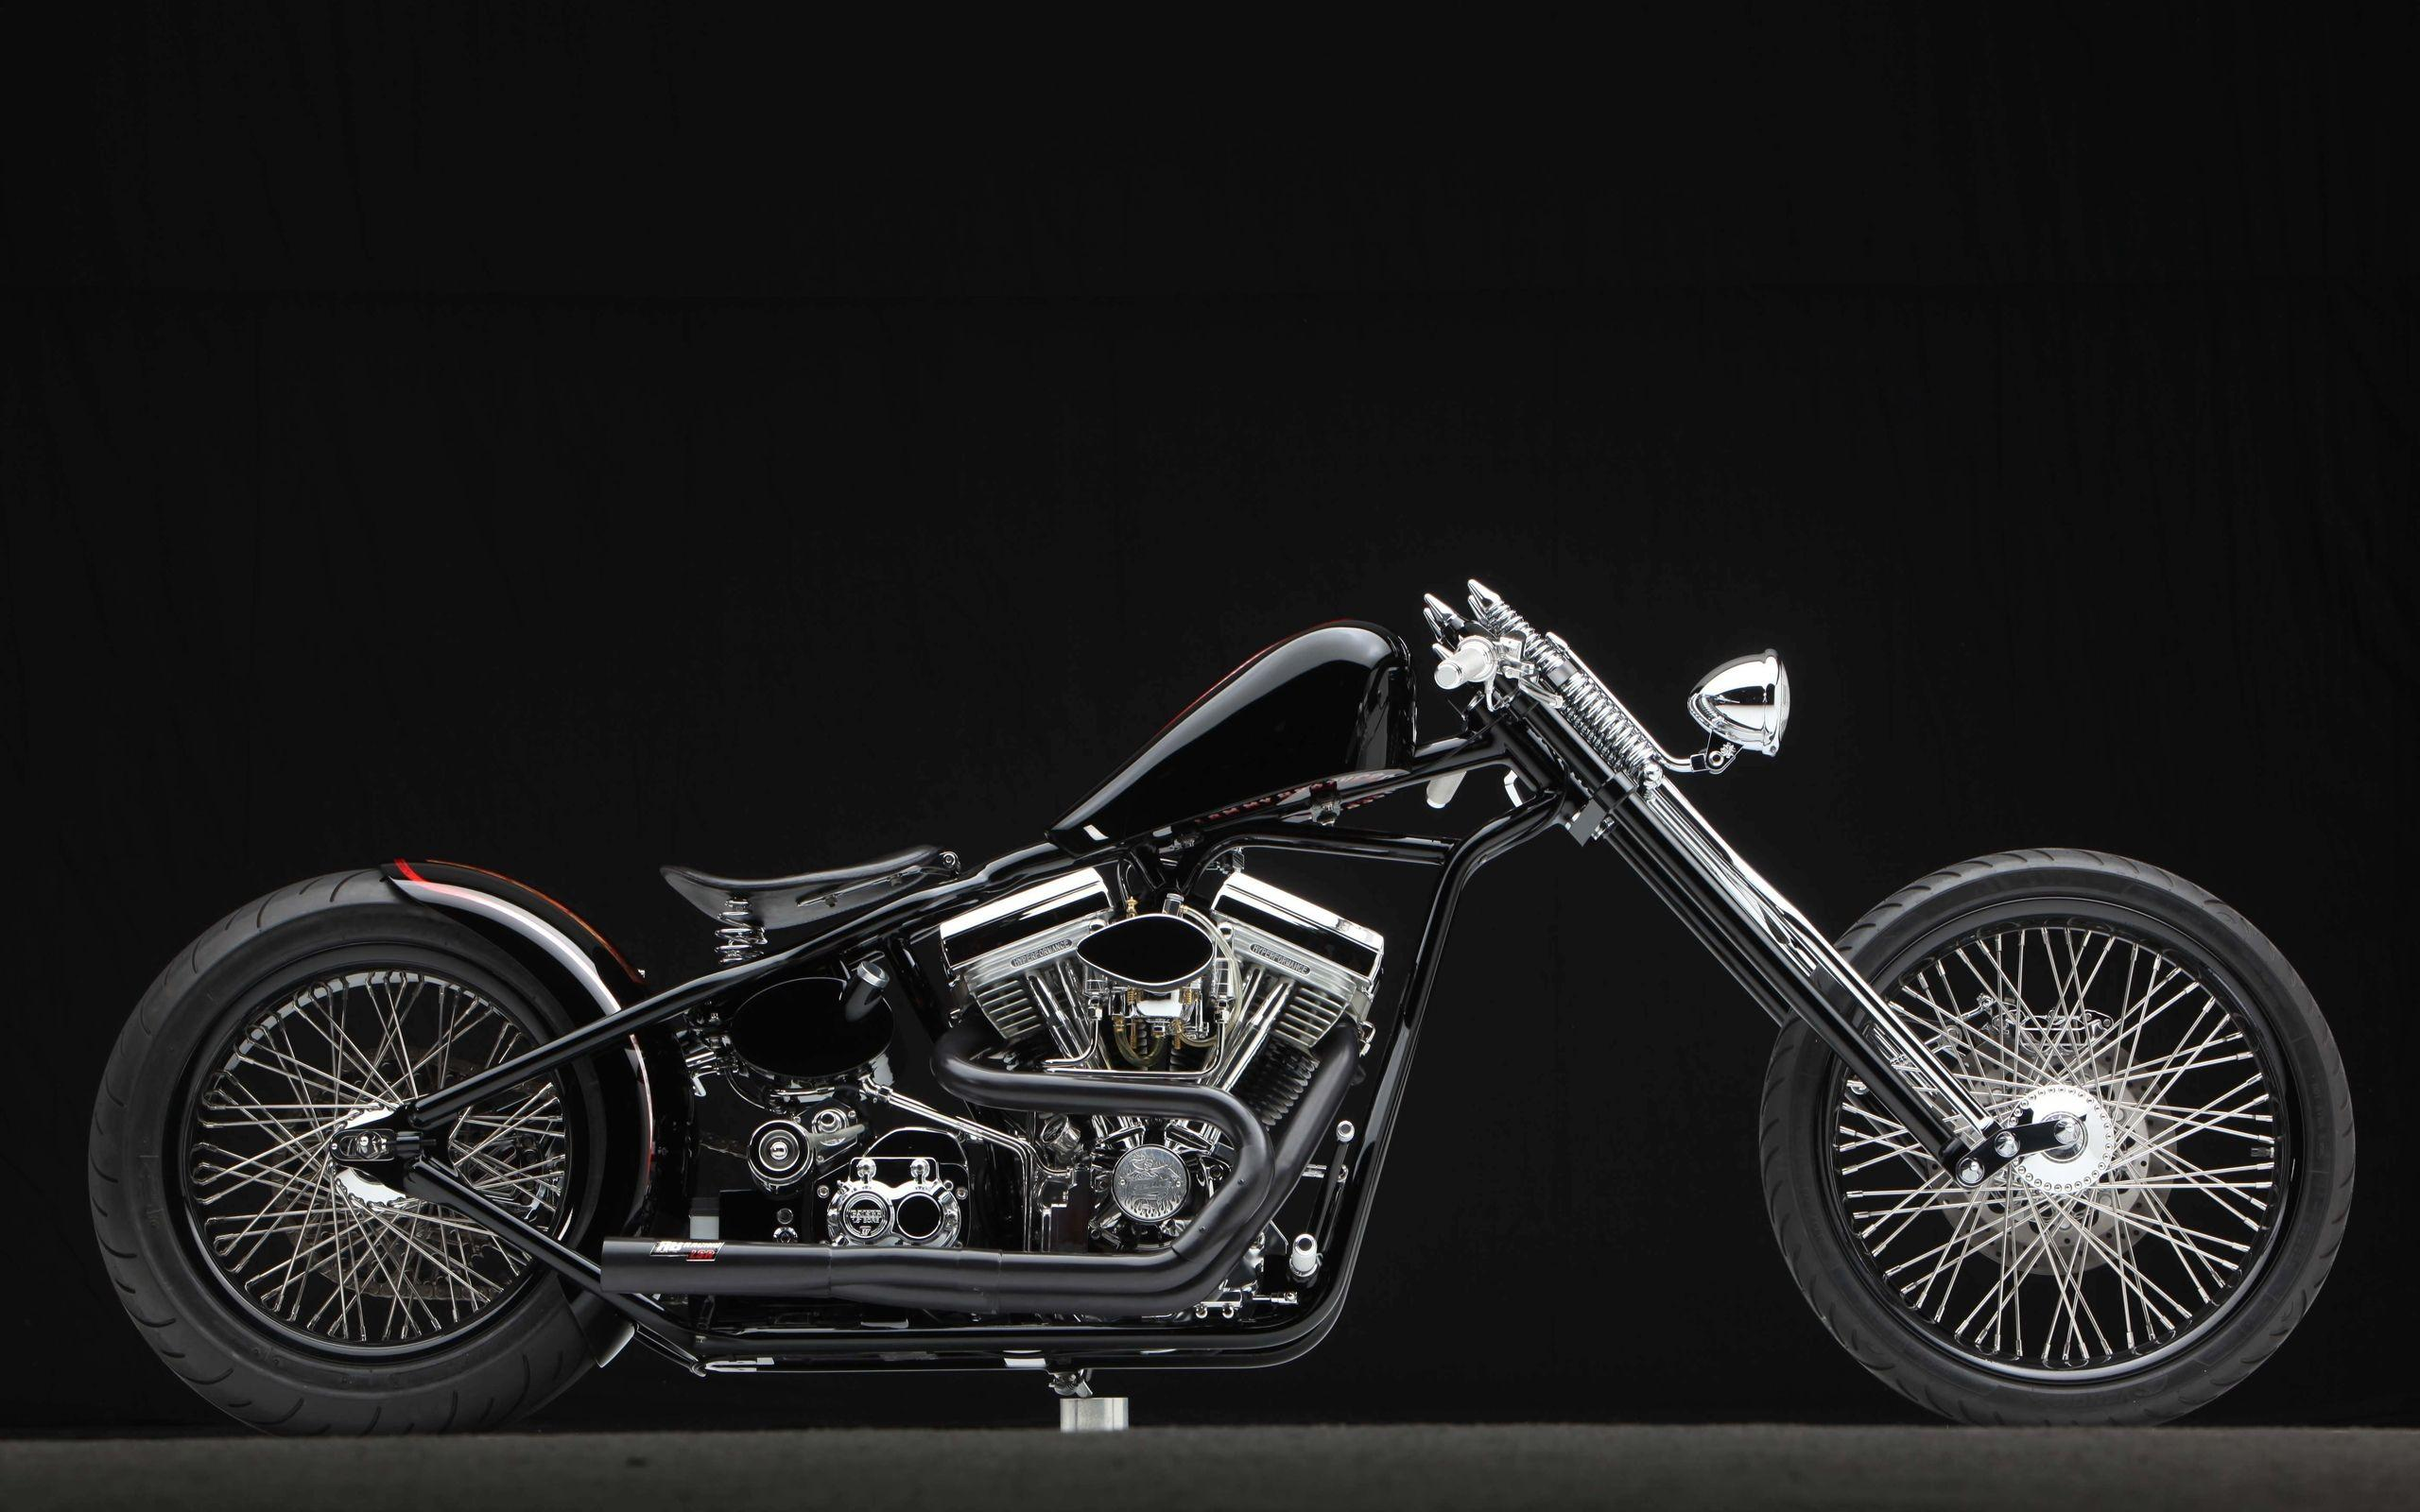 3259 V Nappes Papier Peint-MOTO Harley Davidson Chopper Bike Wallpaper Design